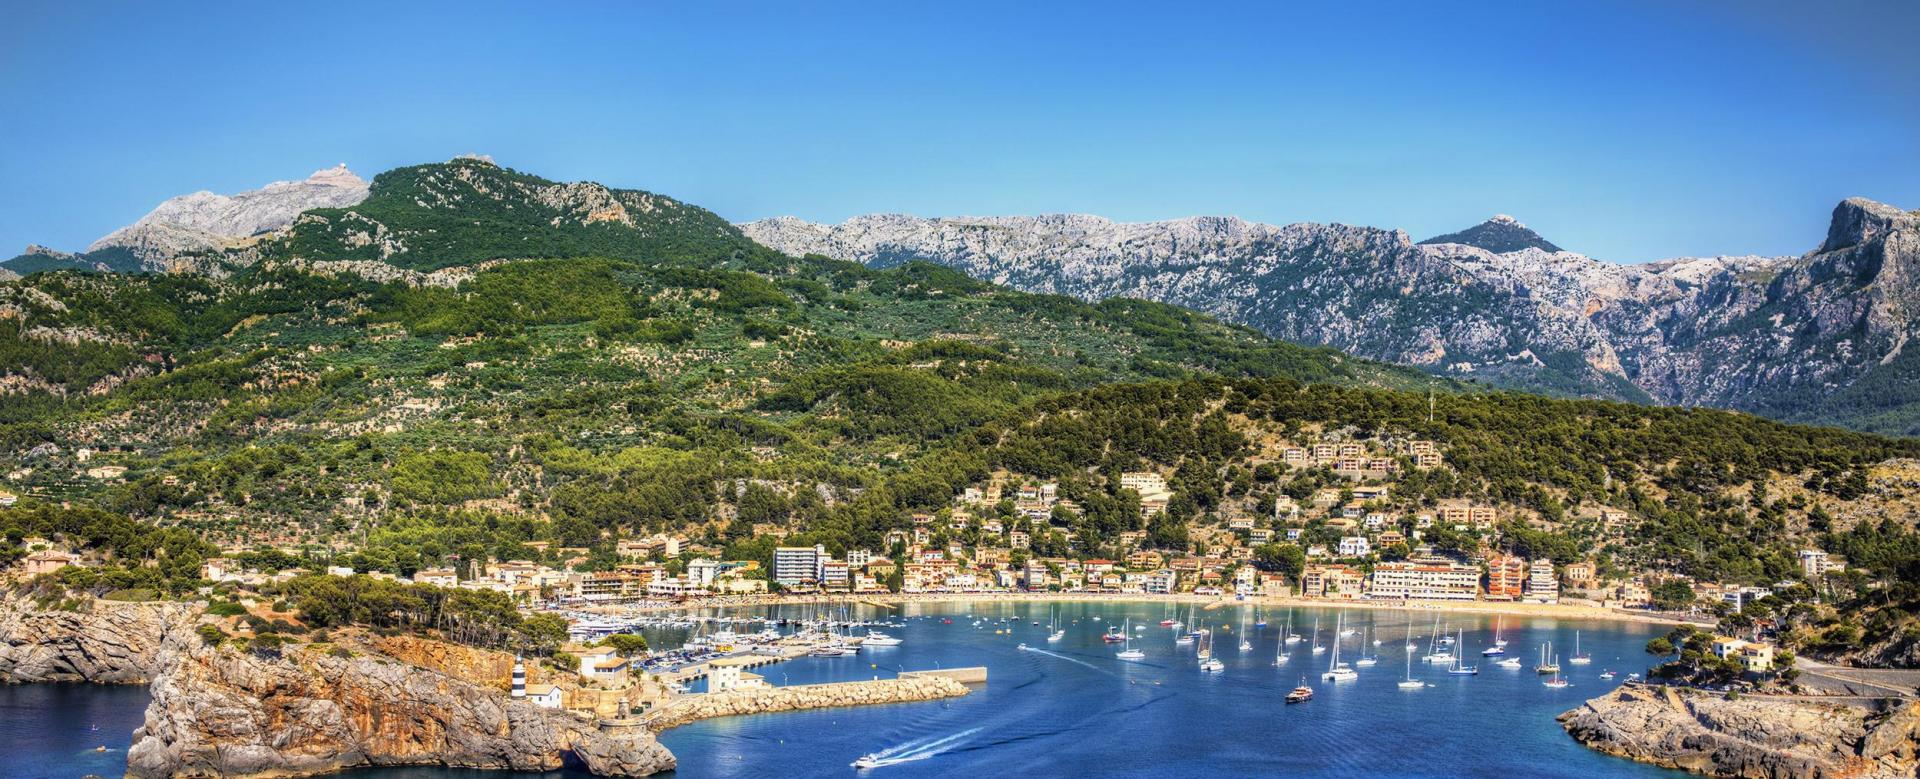 Voyage à pied : La Palma : Balade majorquine